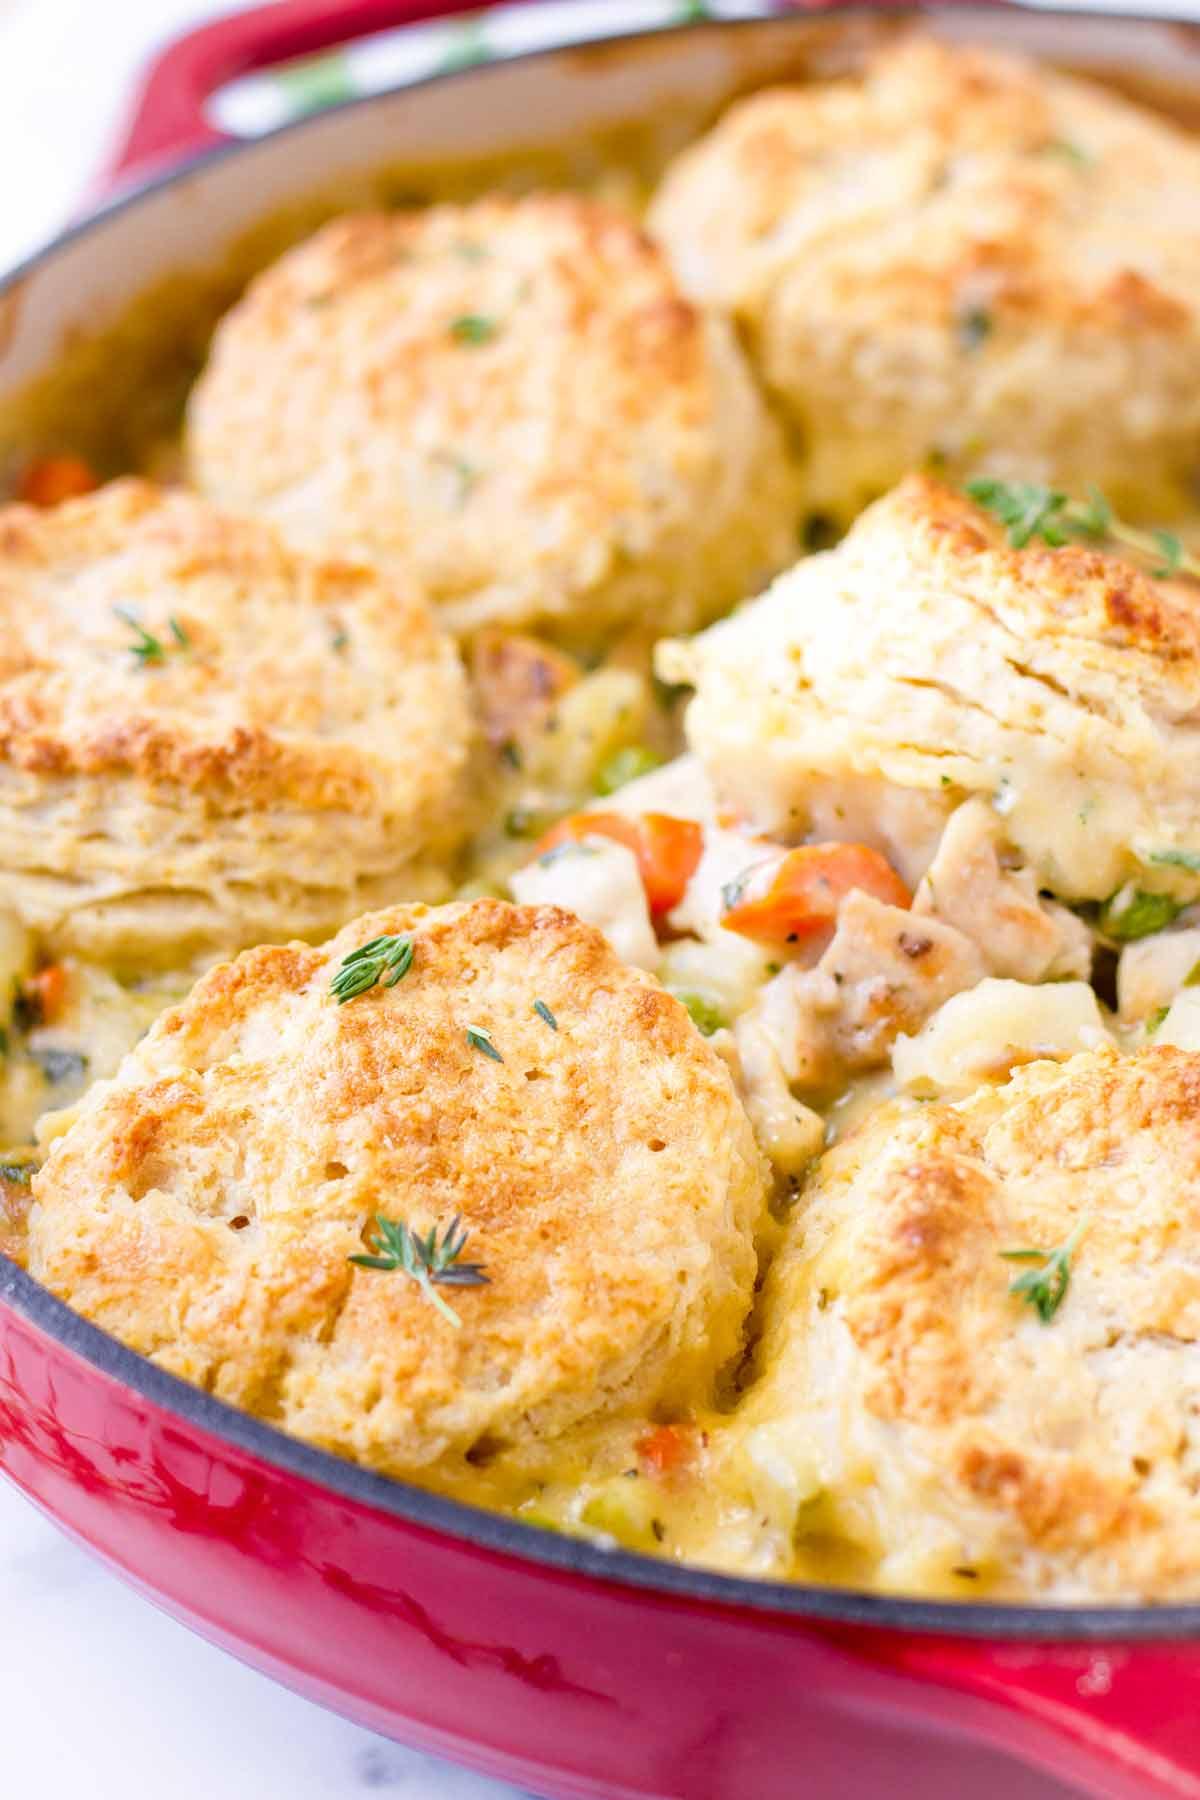 close up of biscuit chicken pot pie dish